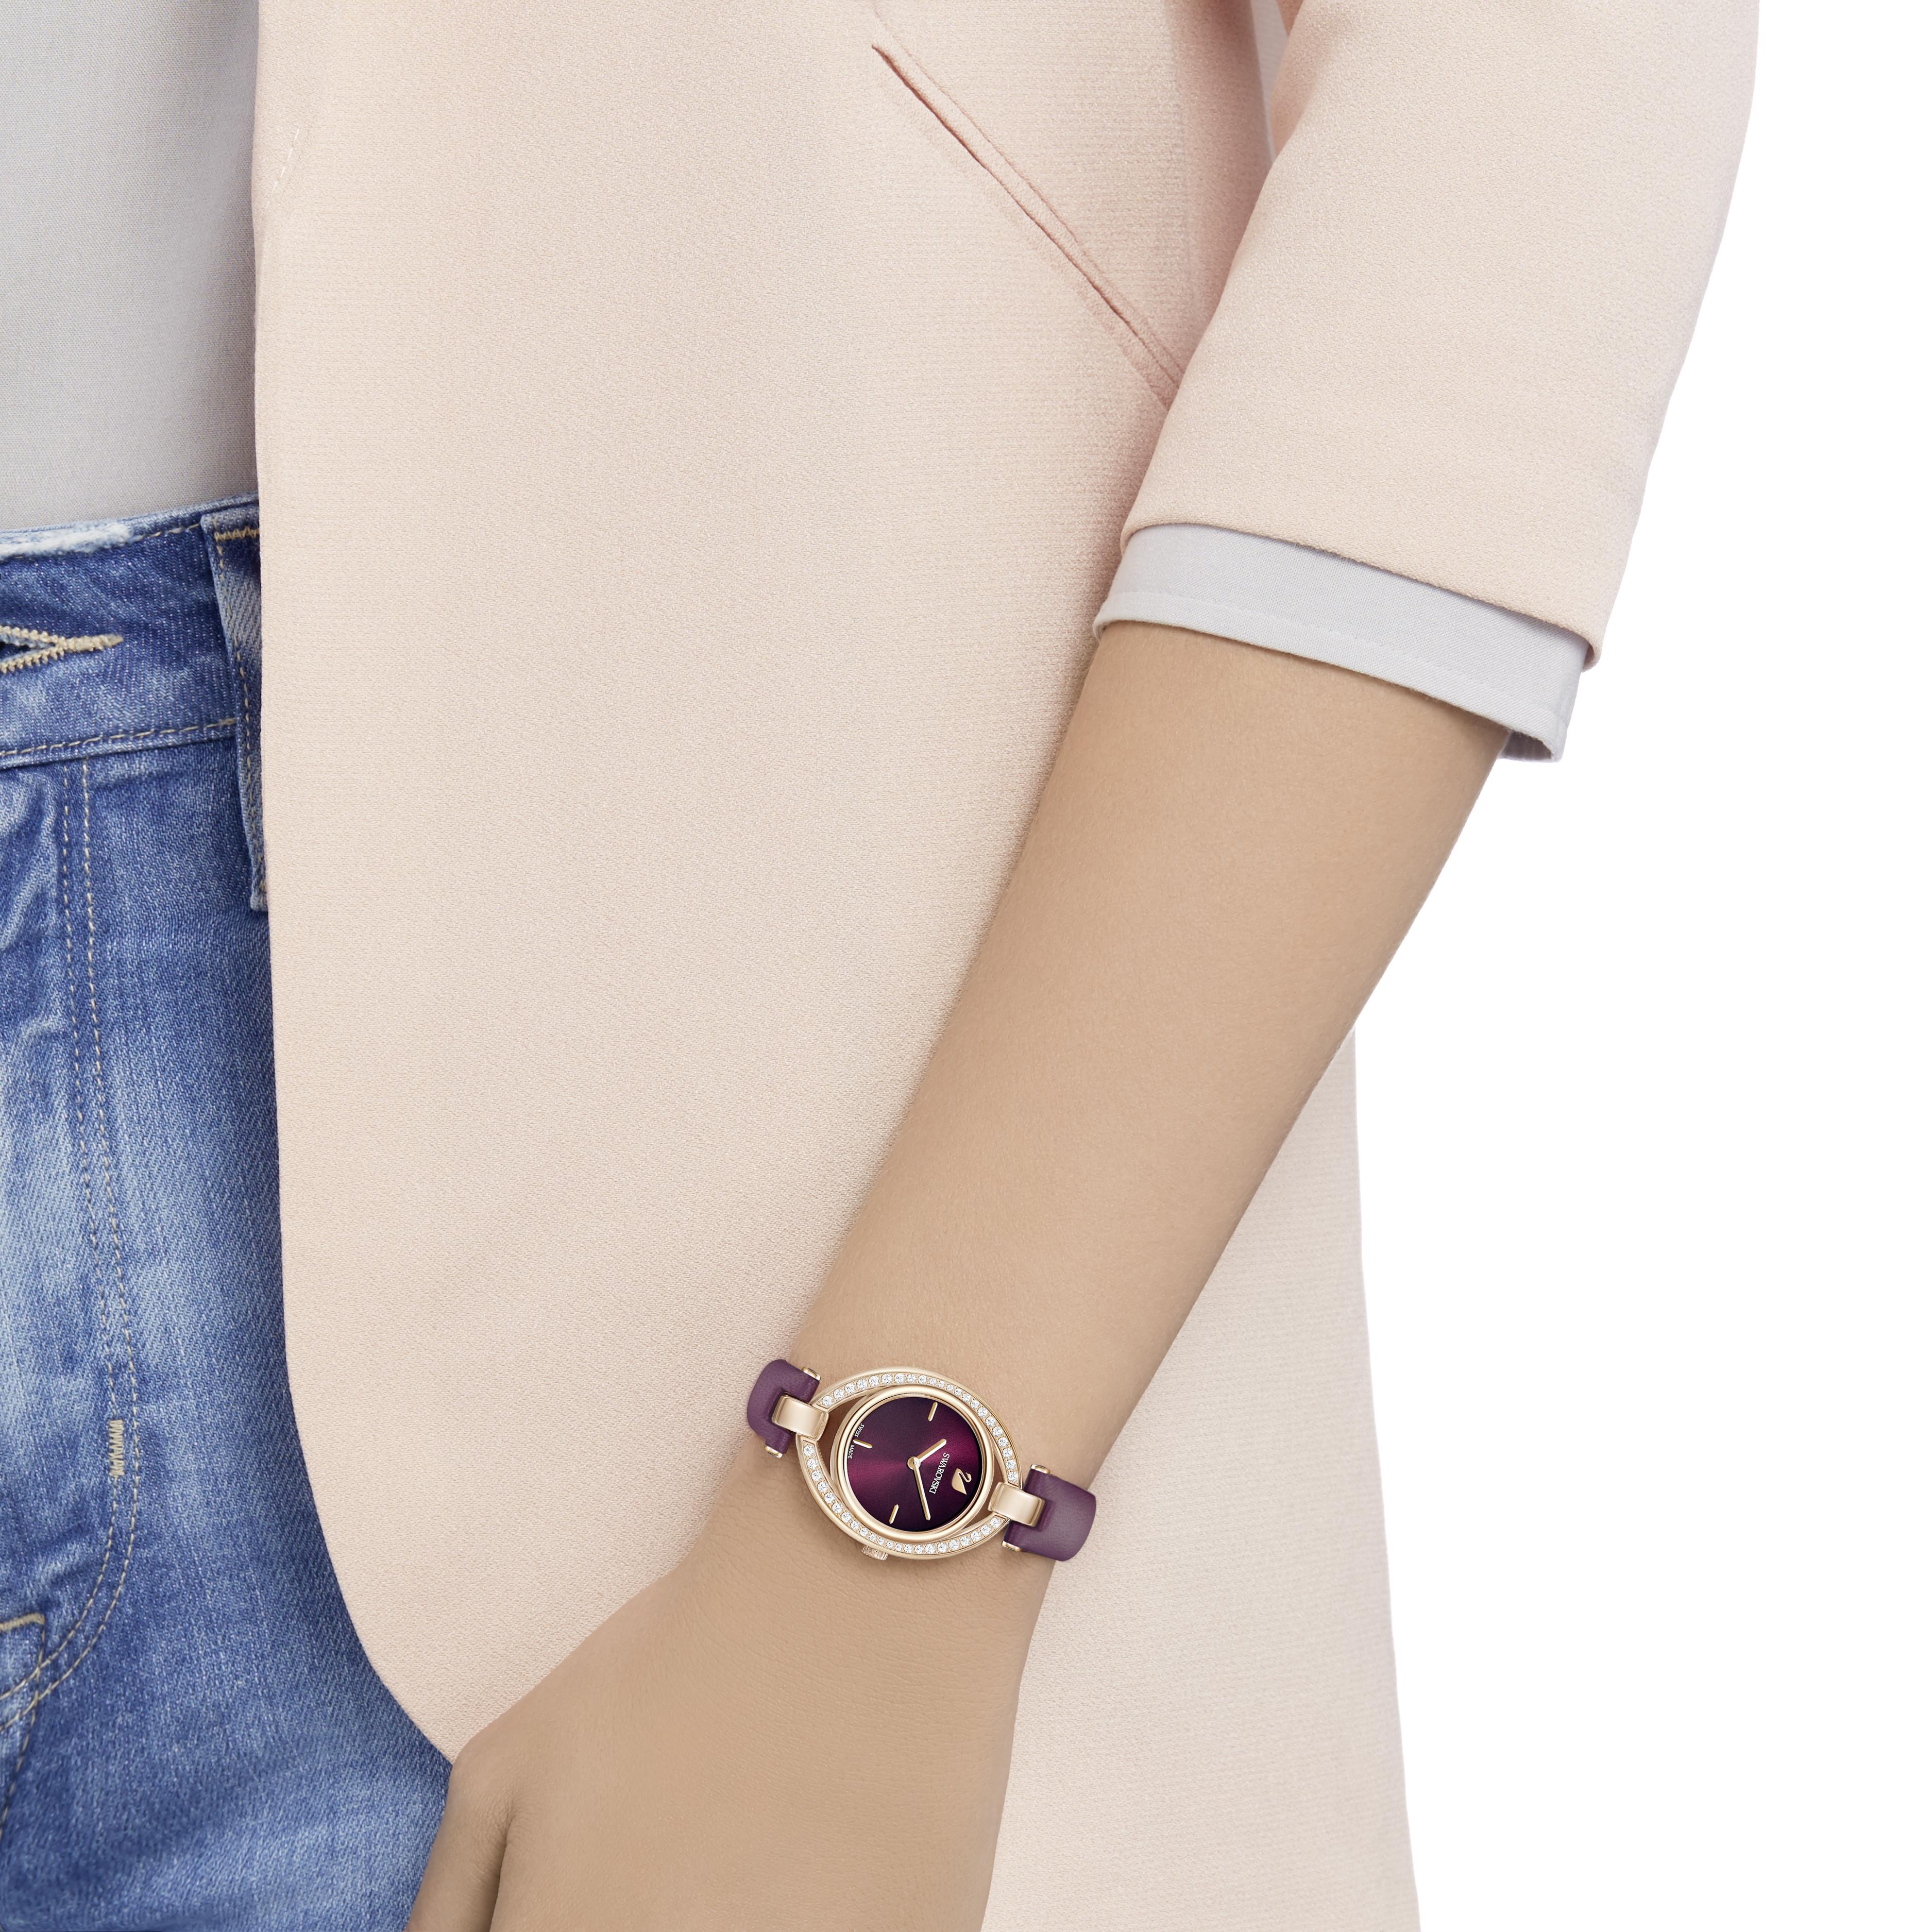 Stella Watch, Leather Strap, Dark Red, Rose Gold Tone